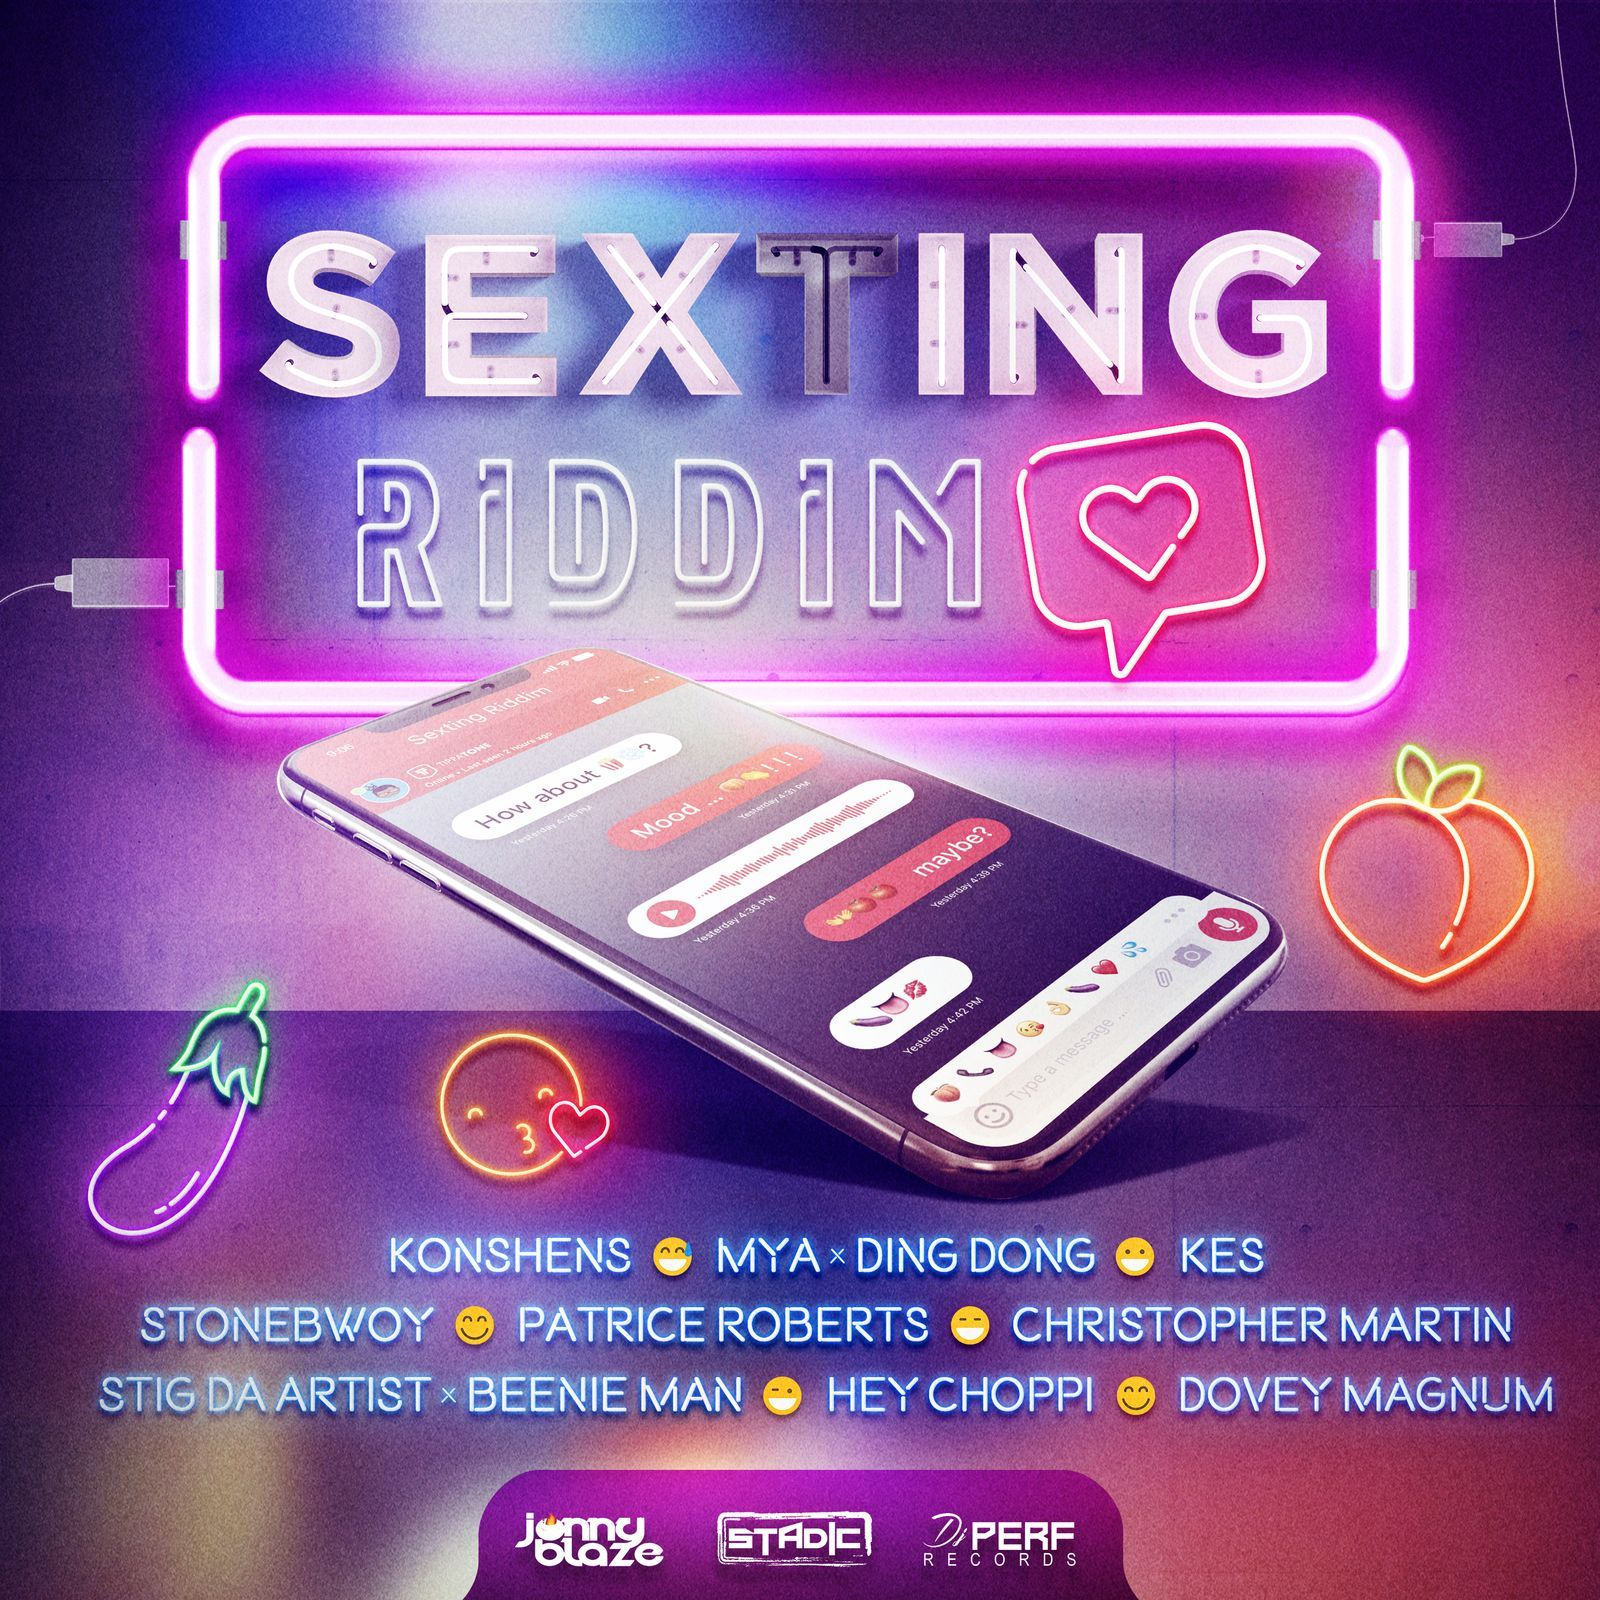 Sexting Riddim Instrumental by Jonny Blaze, Stadic & DJ Perf from DJ